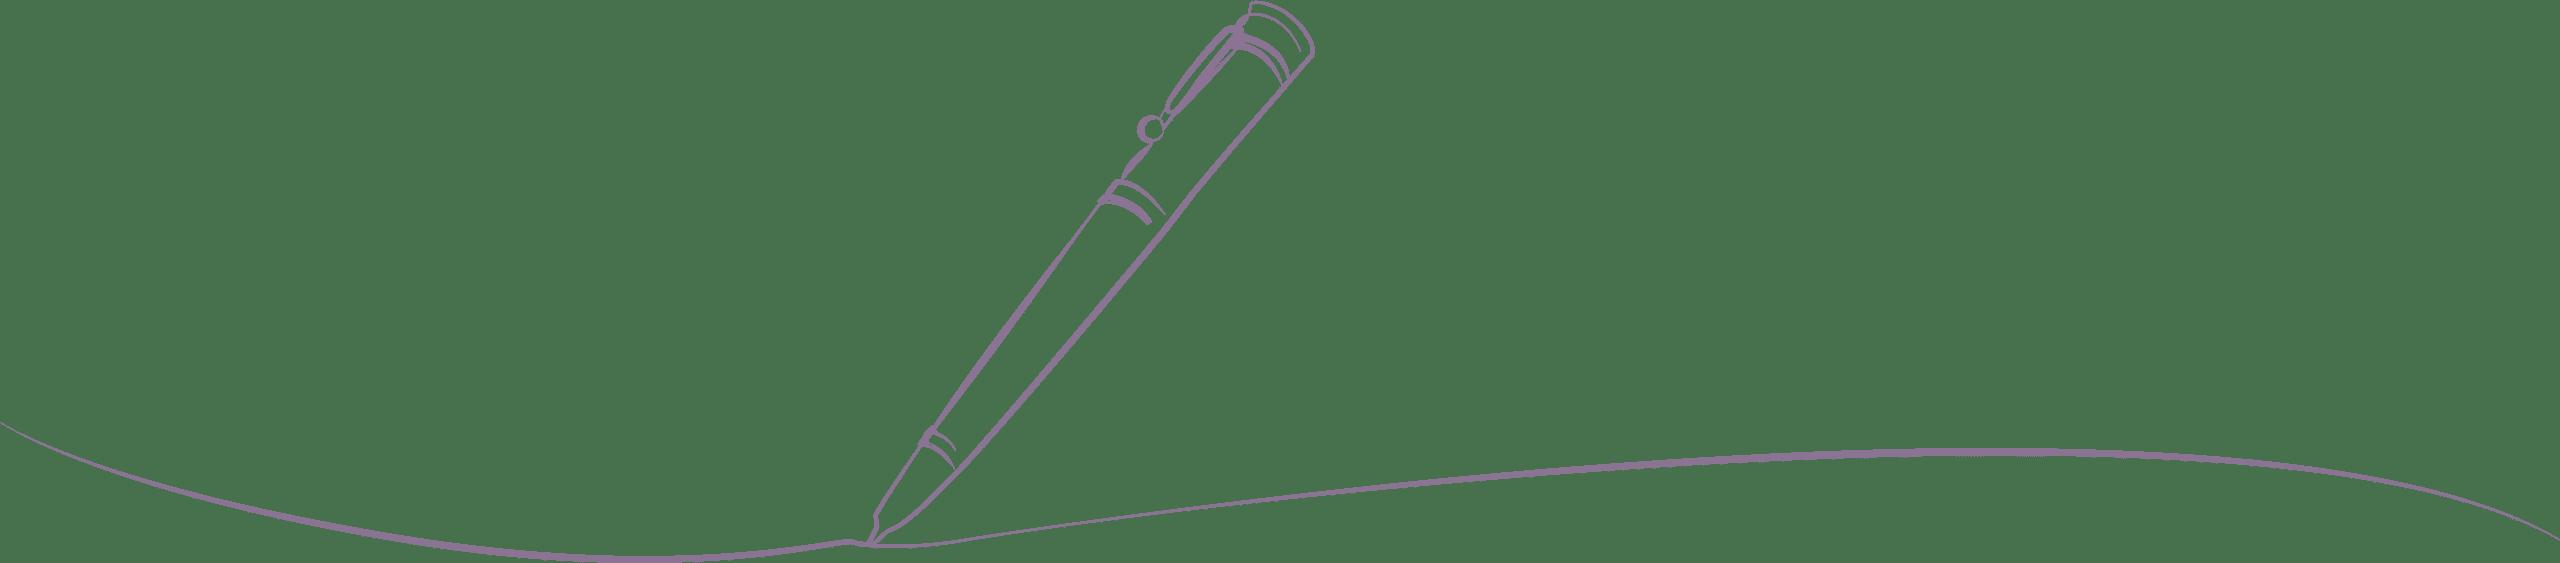 stylo2_separation_blog_laurence_perrin_experte_management_alsace_france